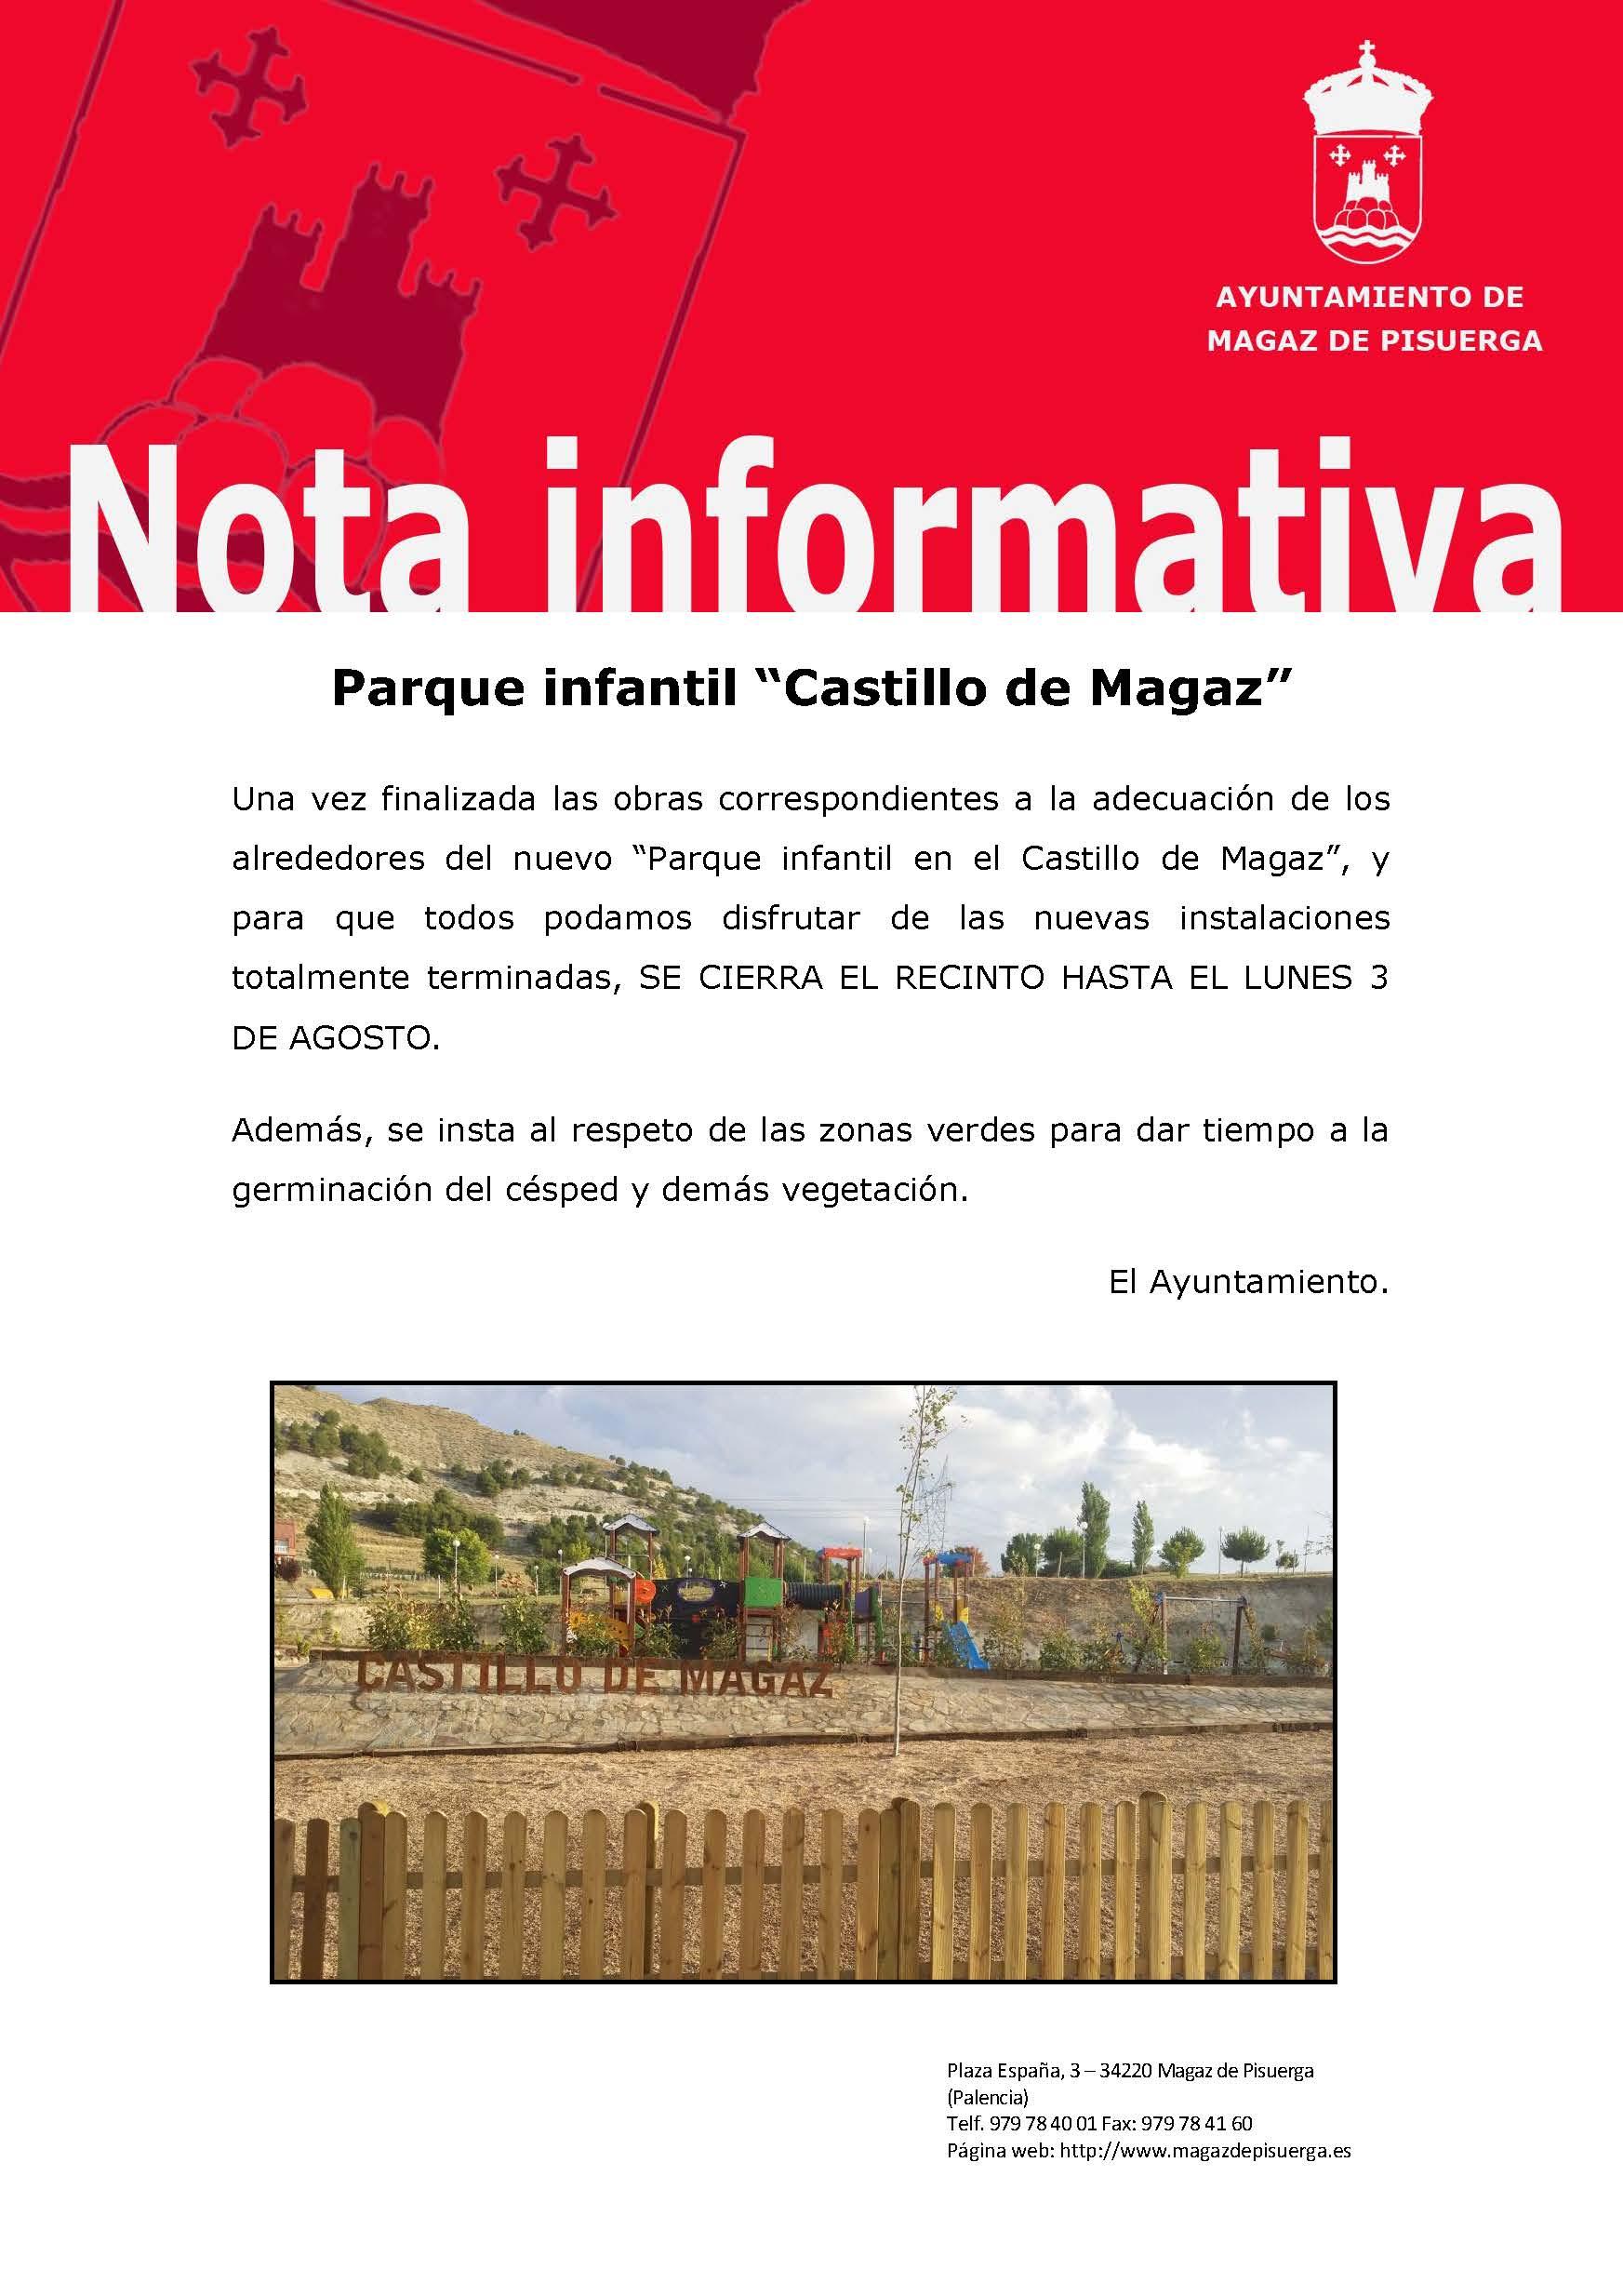 Nota informativa, parque infantil Castillo de Magaz